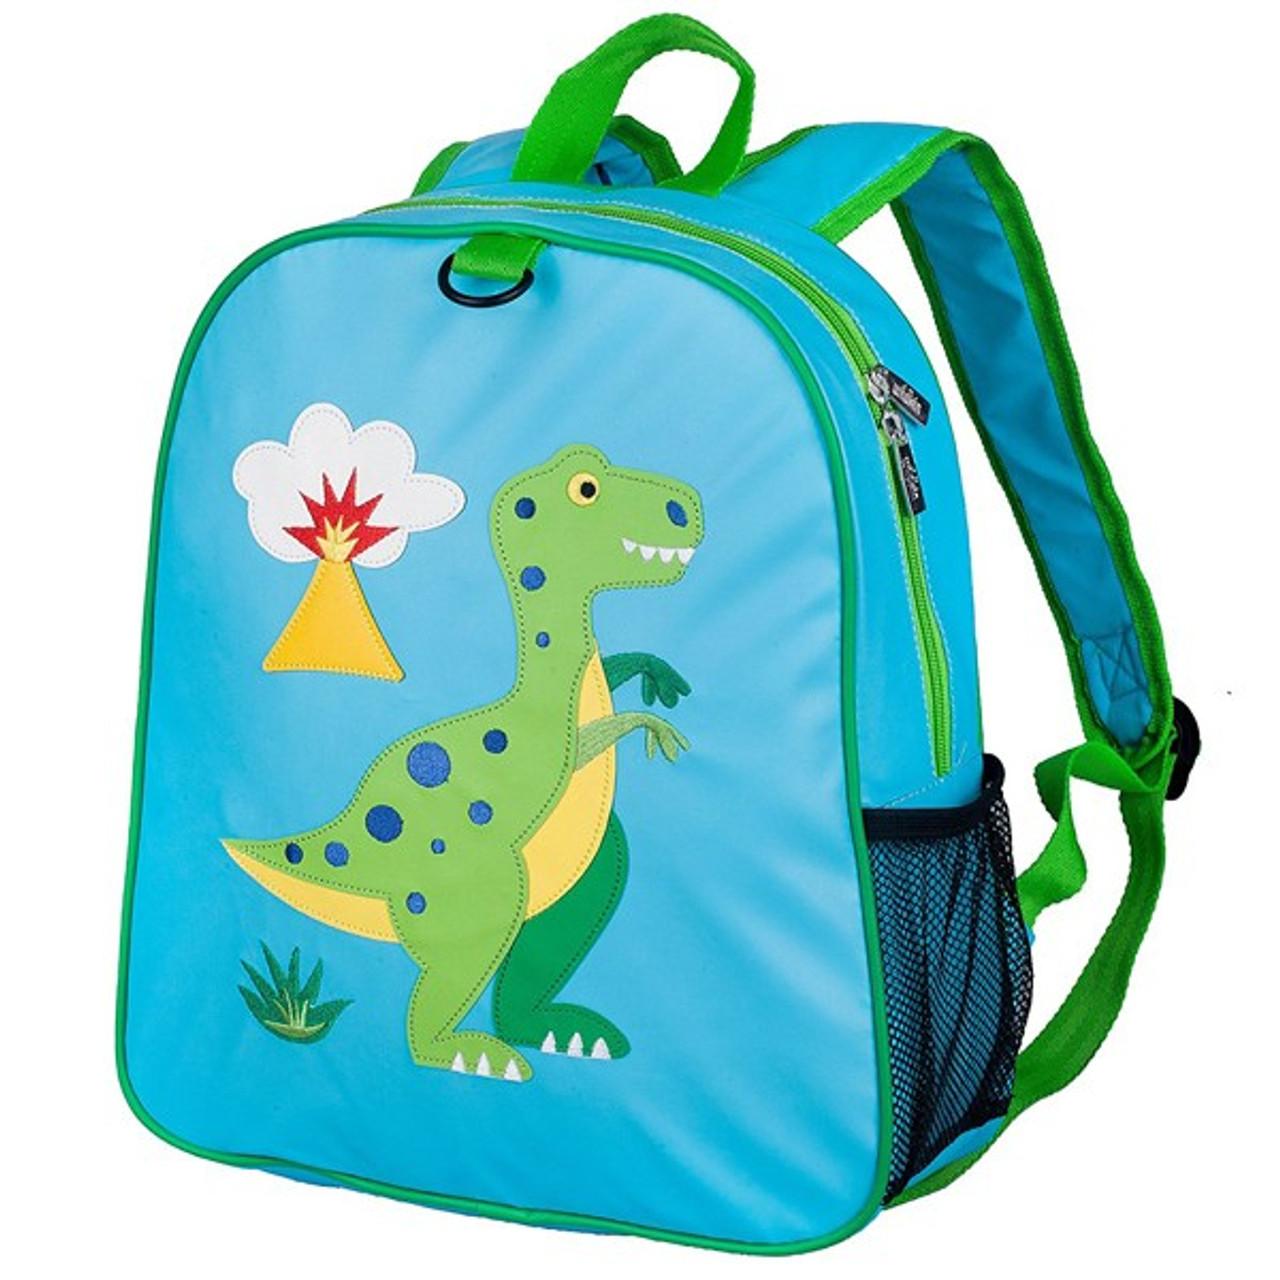 d3434ba8e3f7 Wildkin Embroidered Kids Backpack - Dinosaur